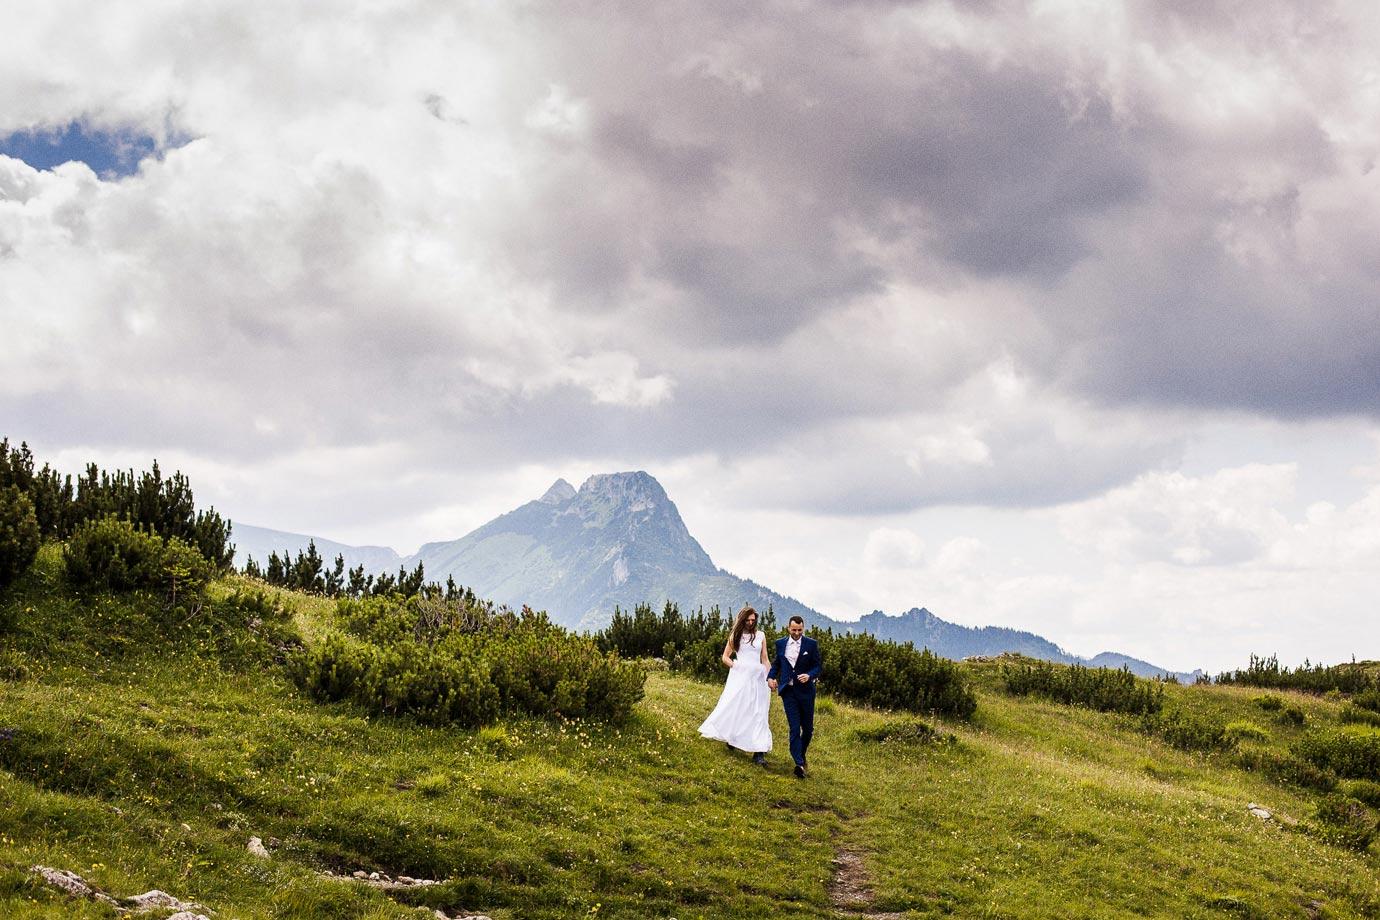 Para ślubna na zboczu górskim